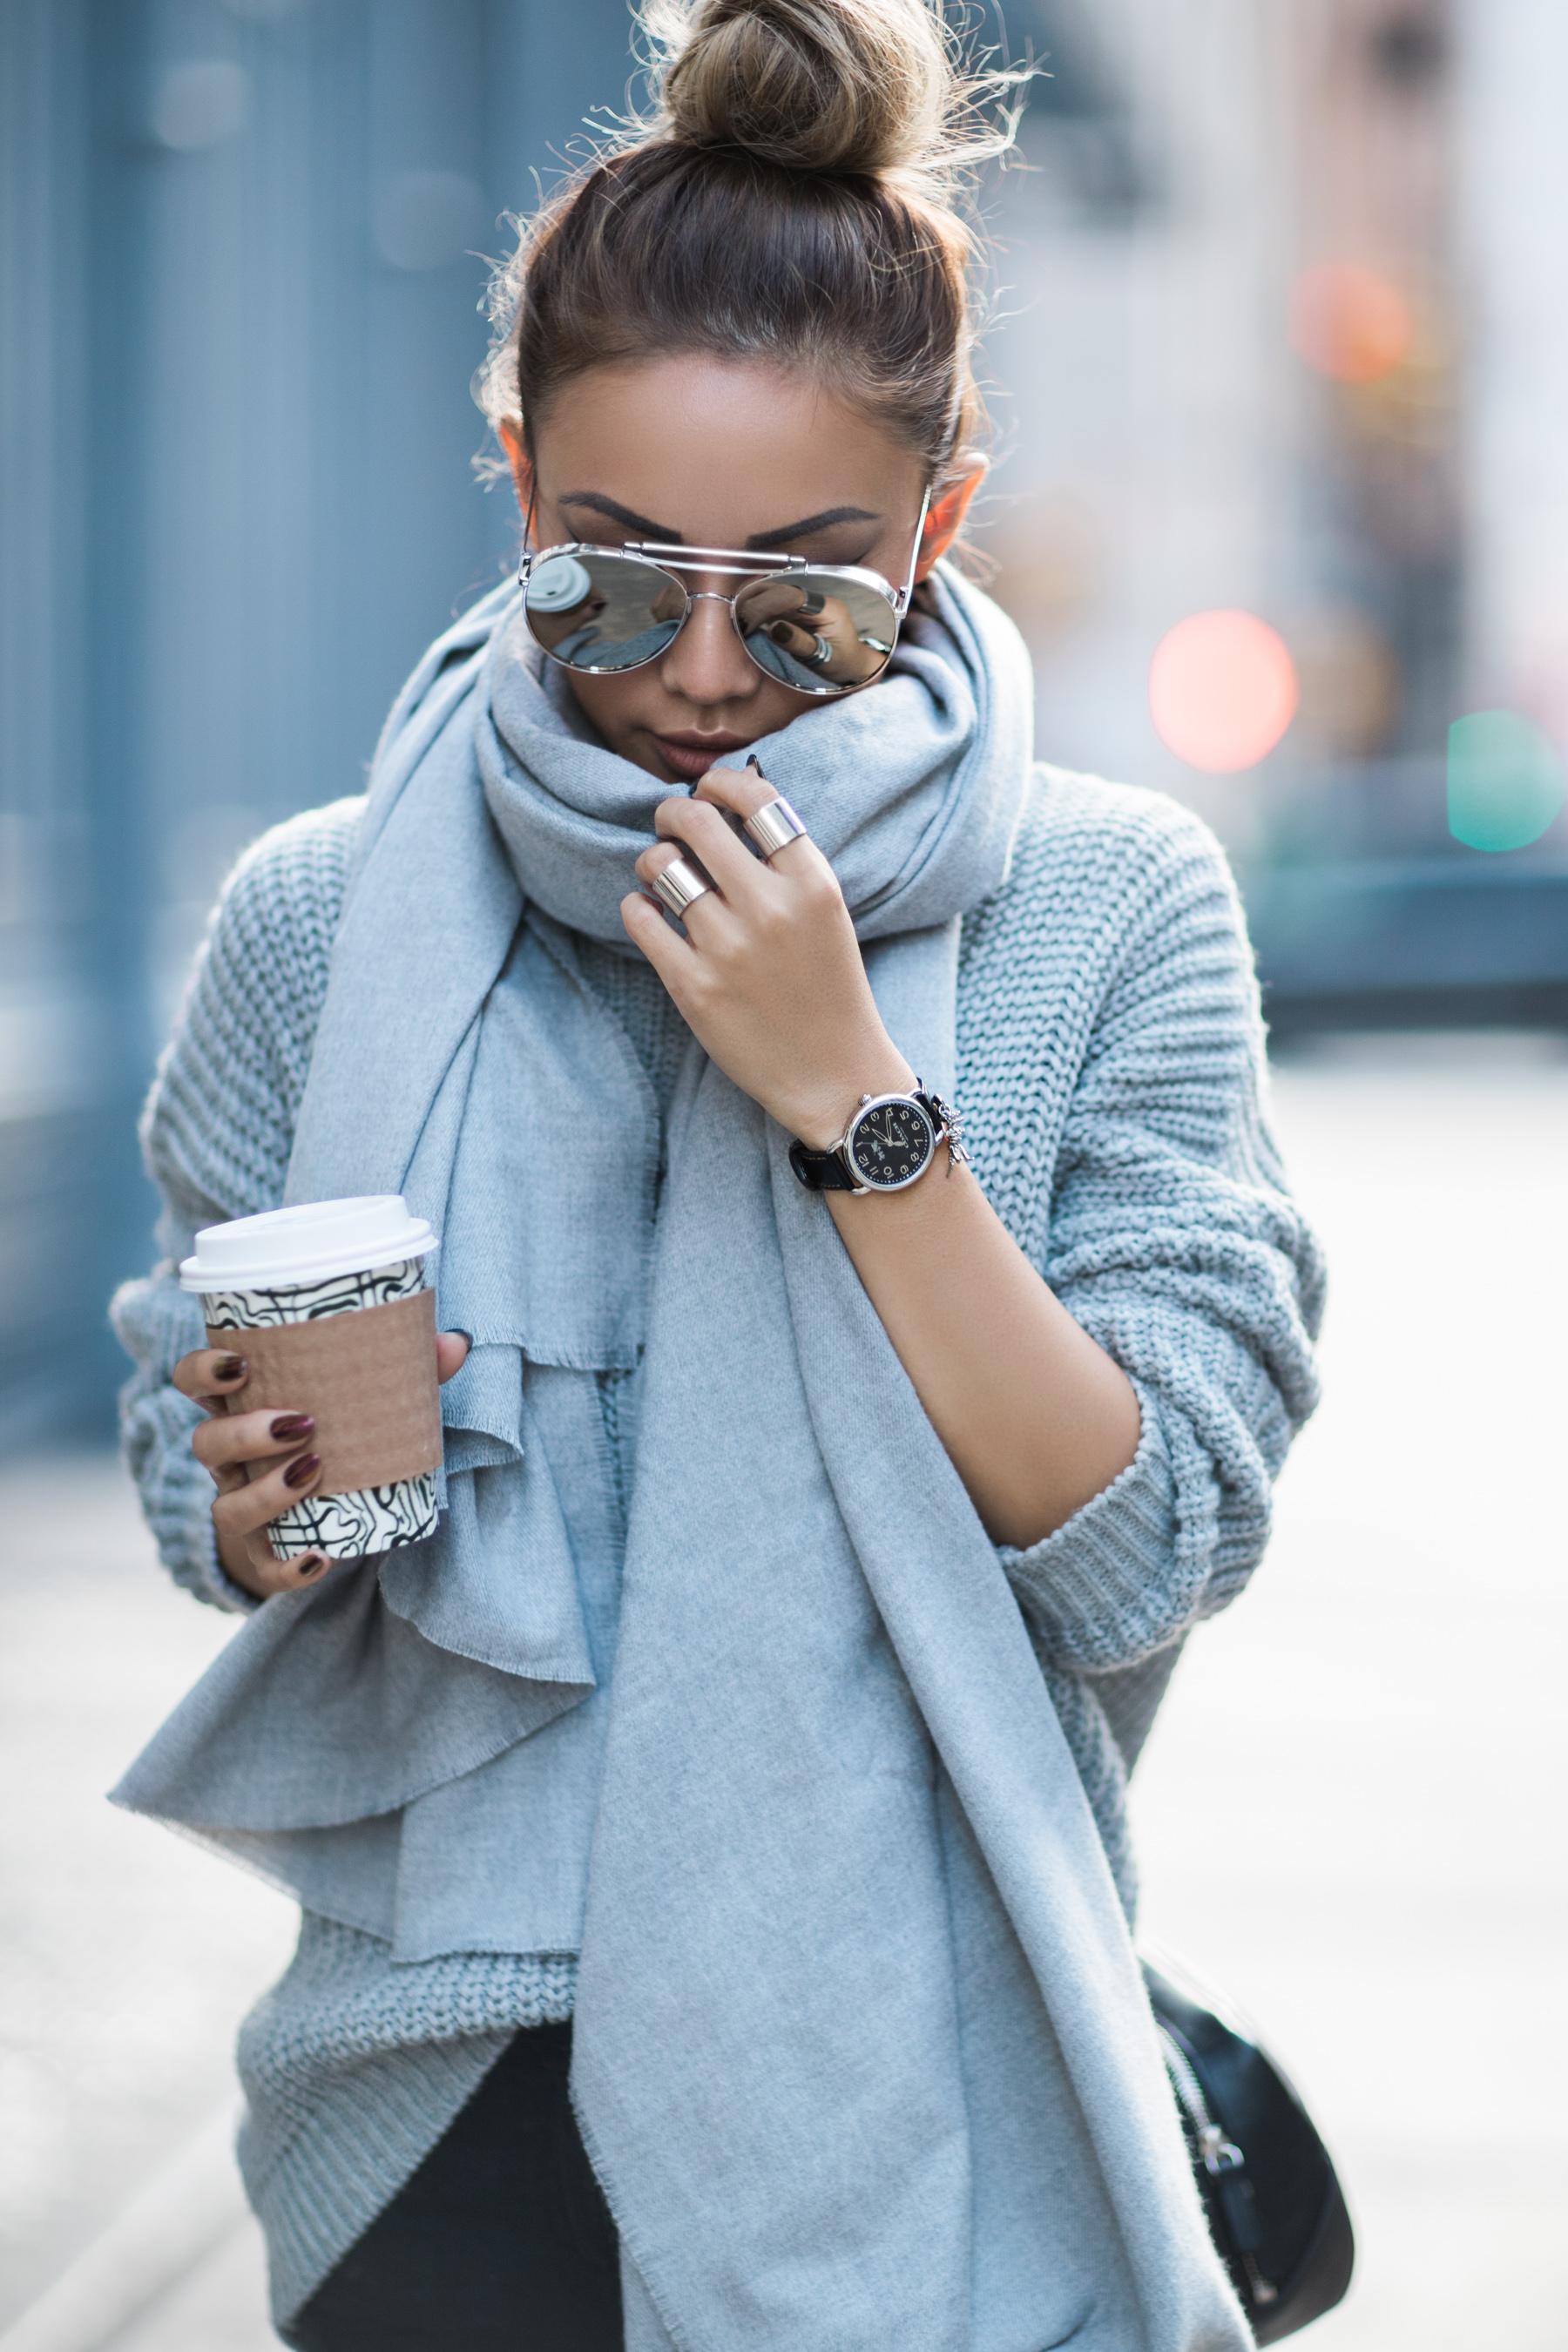 Coach, Delancey, leather strap, watch, NOTJESSFASHION, NYC, Top Fashion Blogger, Lifestyle Blogger, Travel Blogger